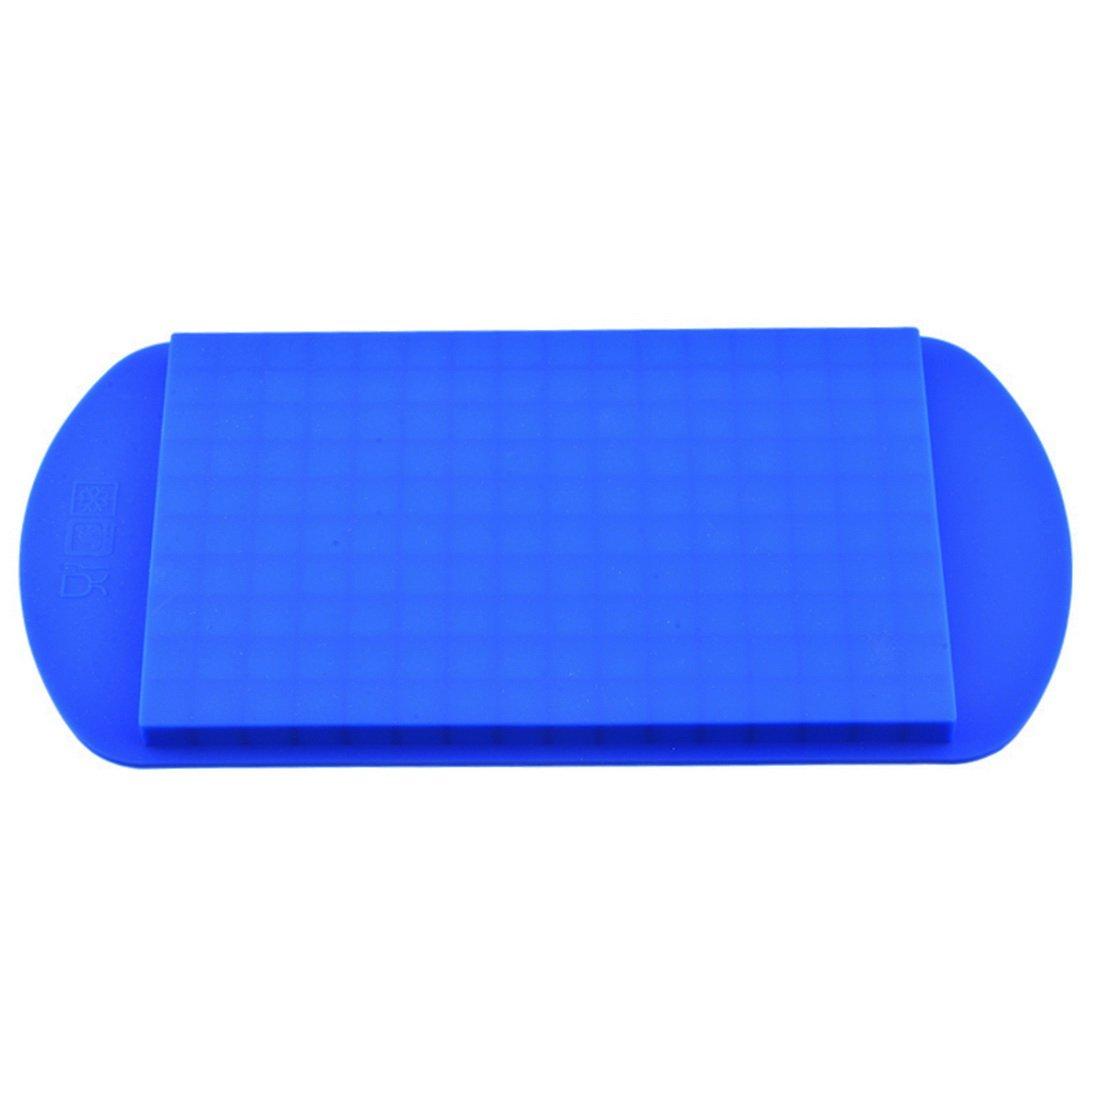 Amazon.com: Snewvie 150/160 Mini Heart Shape/ Cubes Silicone ...